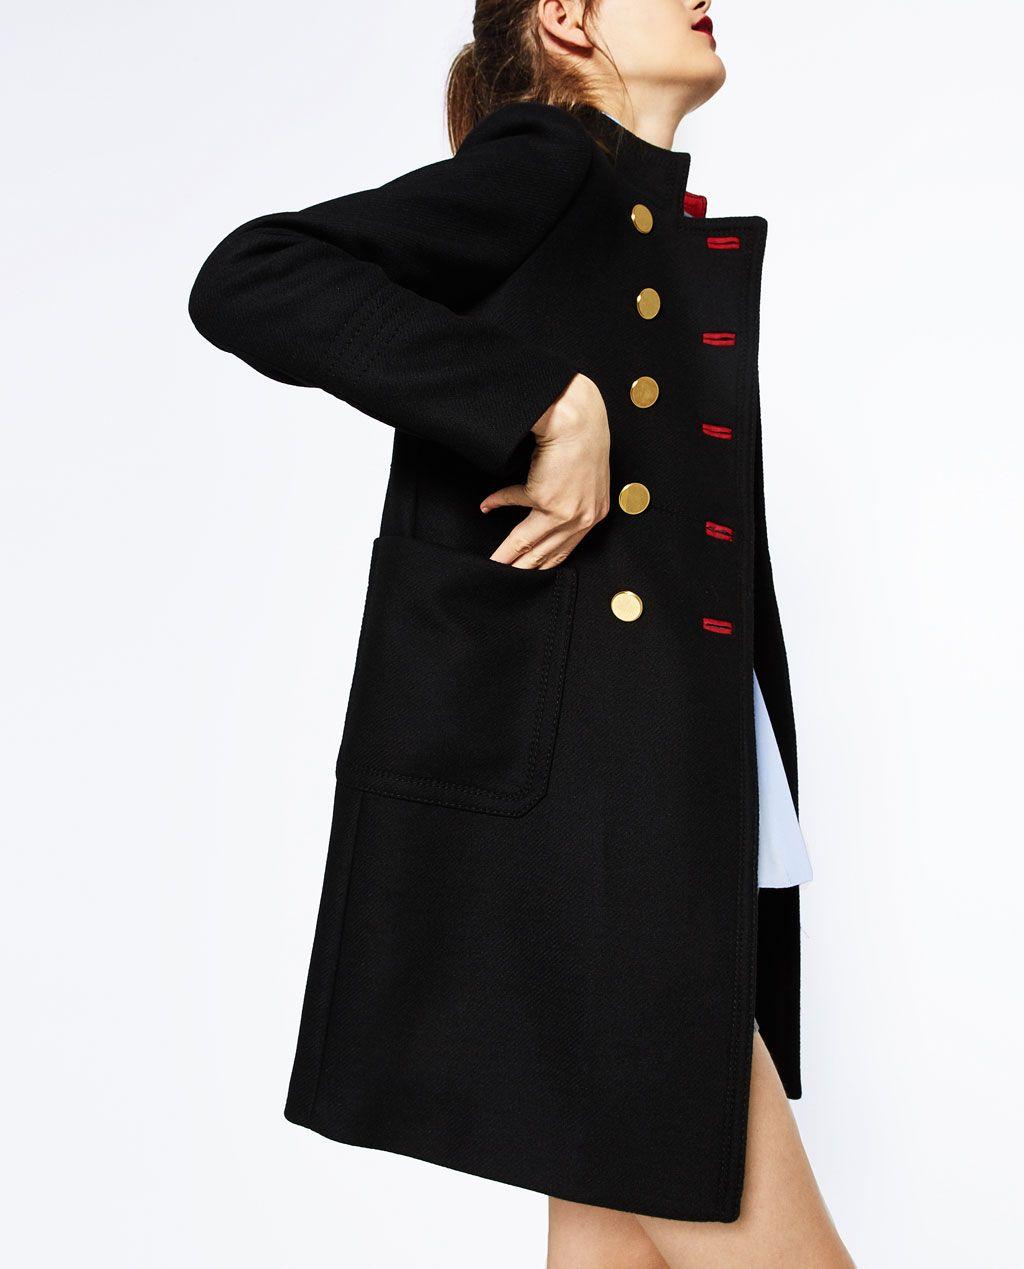 Soldes manteaux femme zara